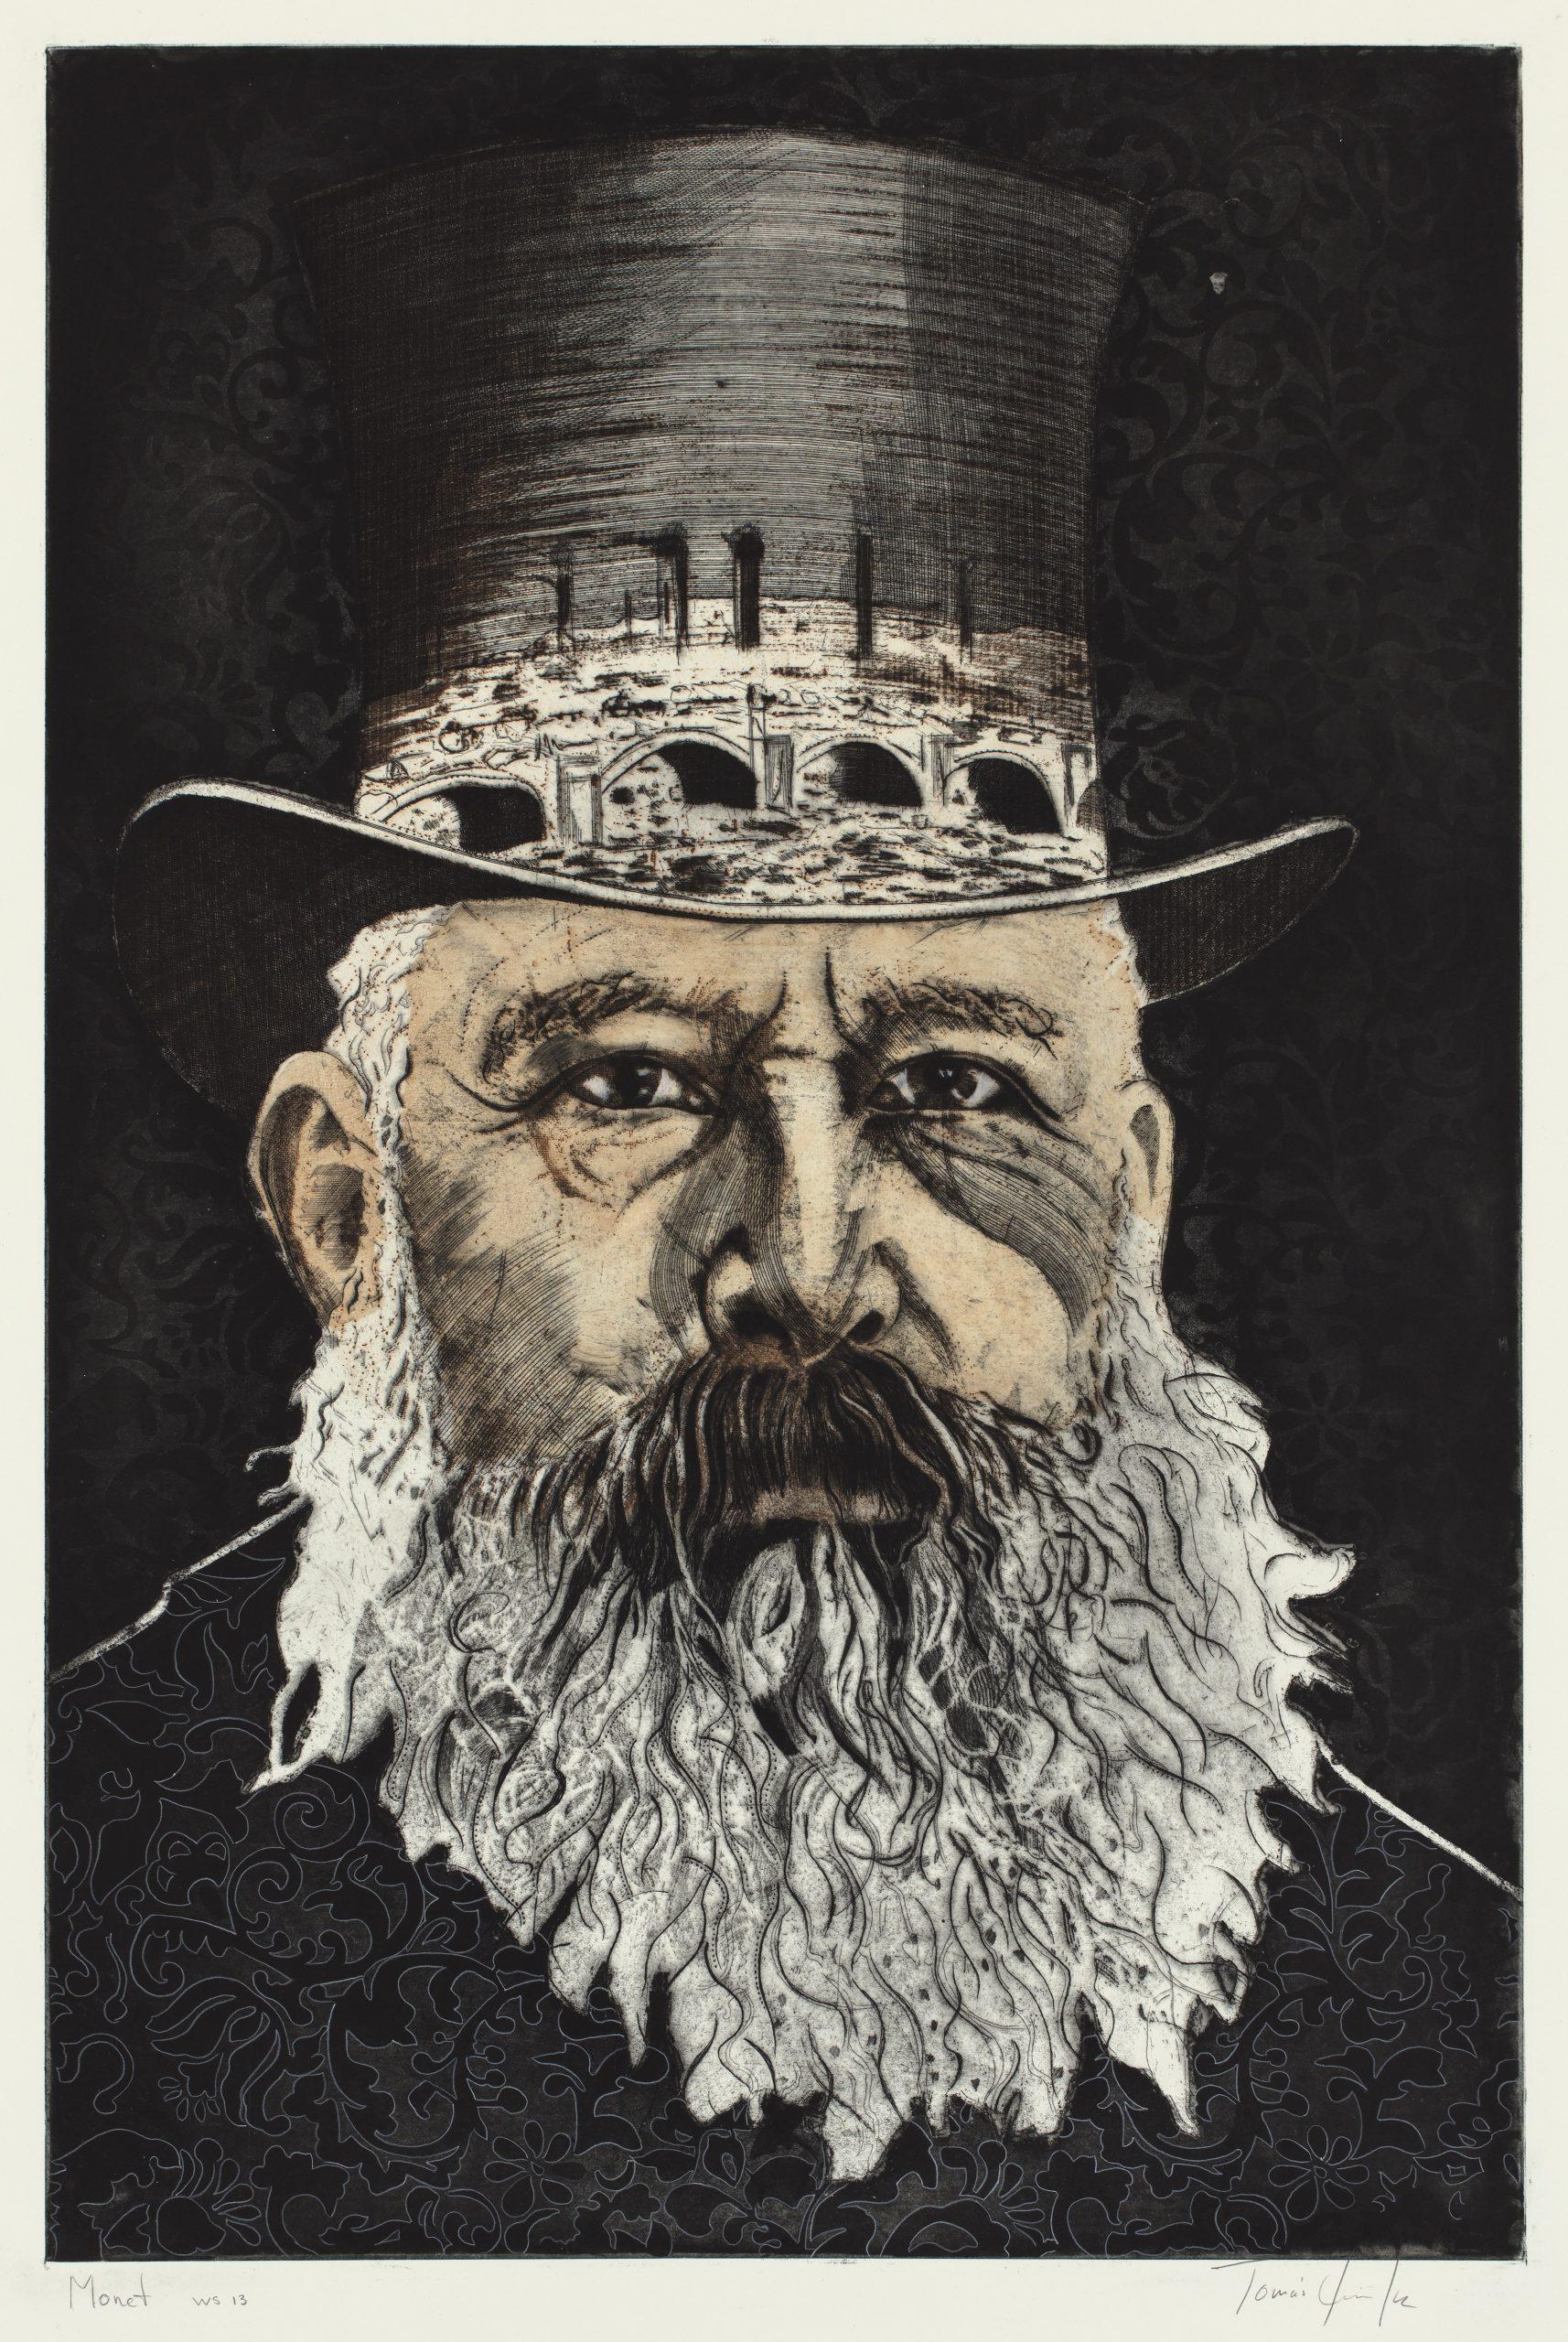 Tomas Lasansky - Monet ws 7